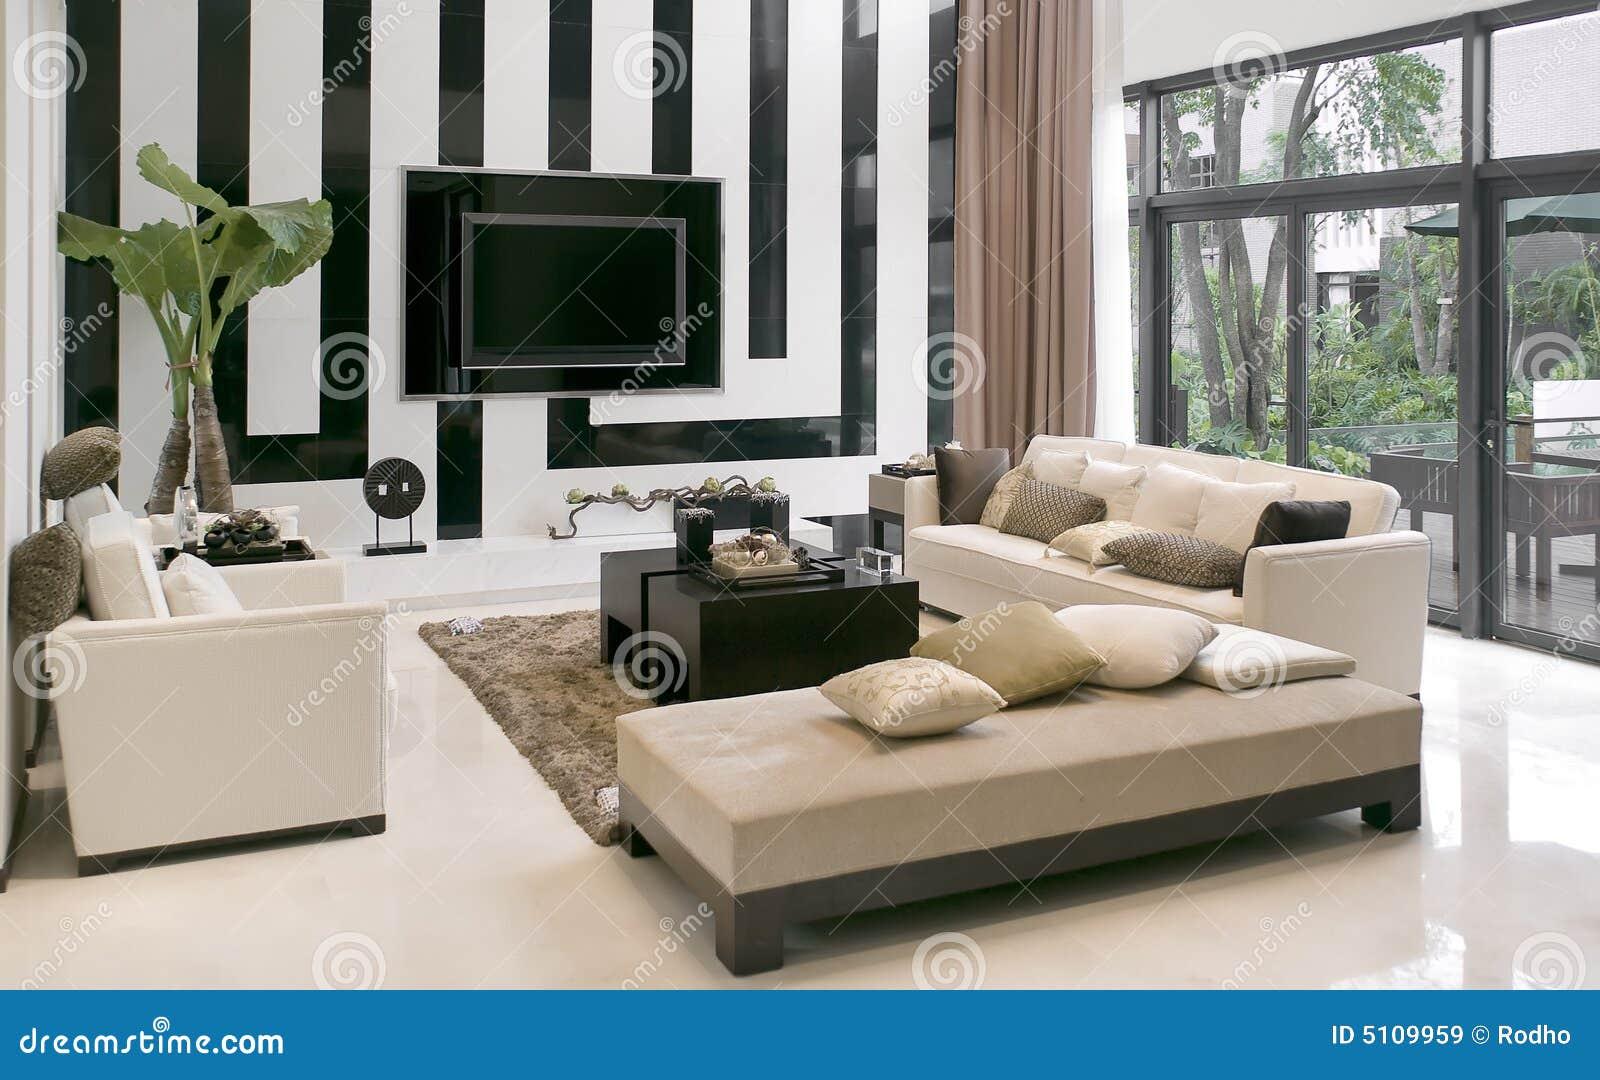 imagenes de muebles modernos: